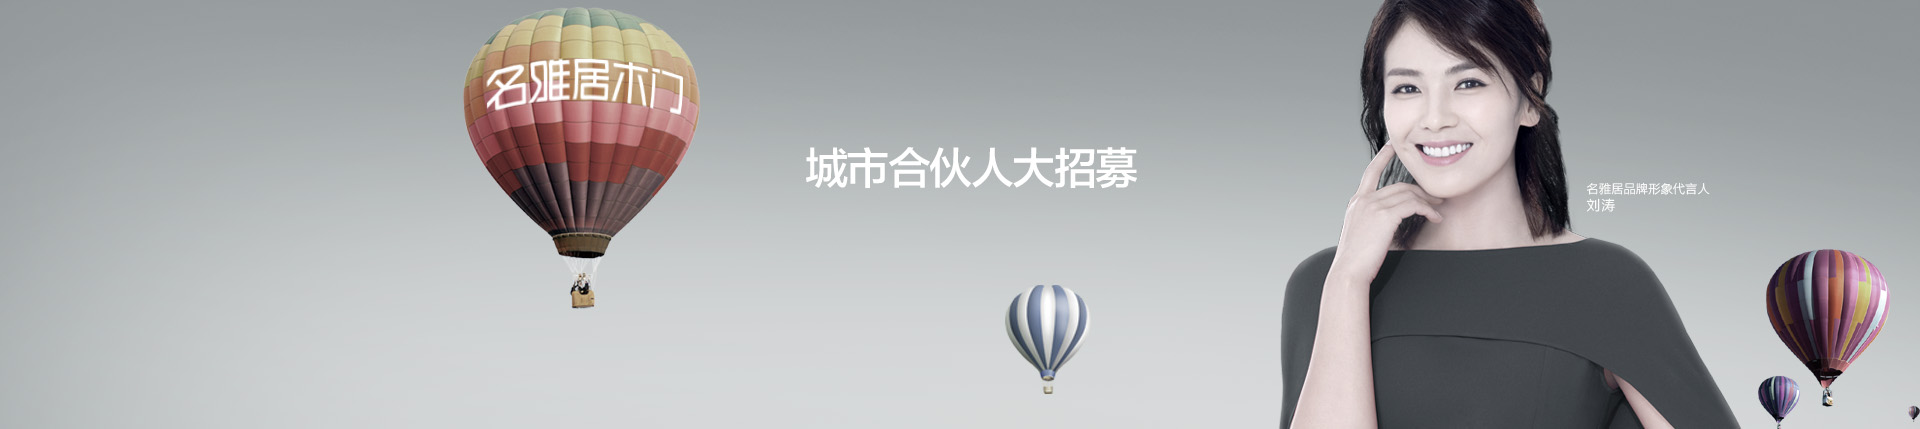 betway必威官网登陆必威体育官网appbetway安卓手机版有限公司